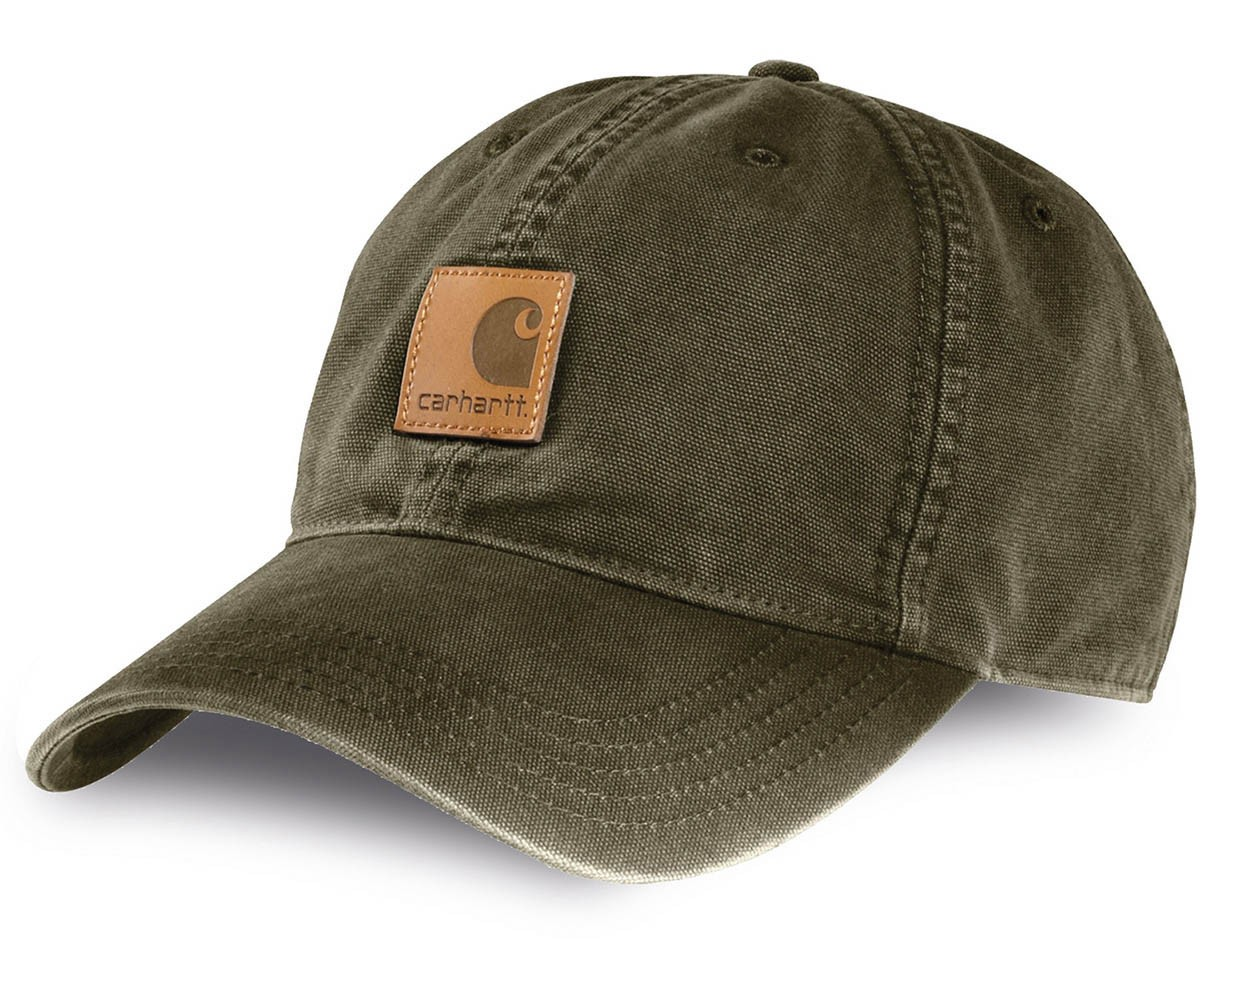 986169a9b0b Carhartt Odessa Cap - Baseball Caps - Hats   Caps - Leisurewear ...